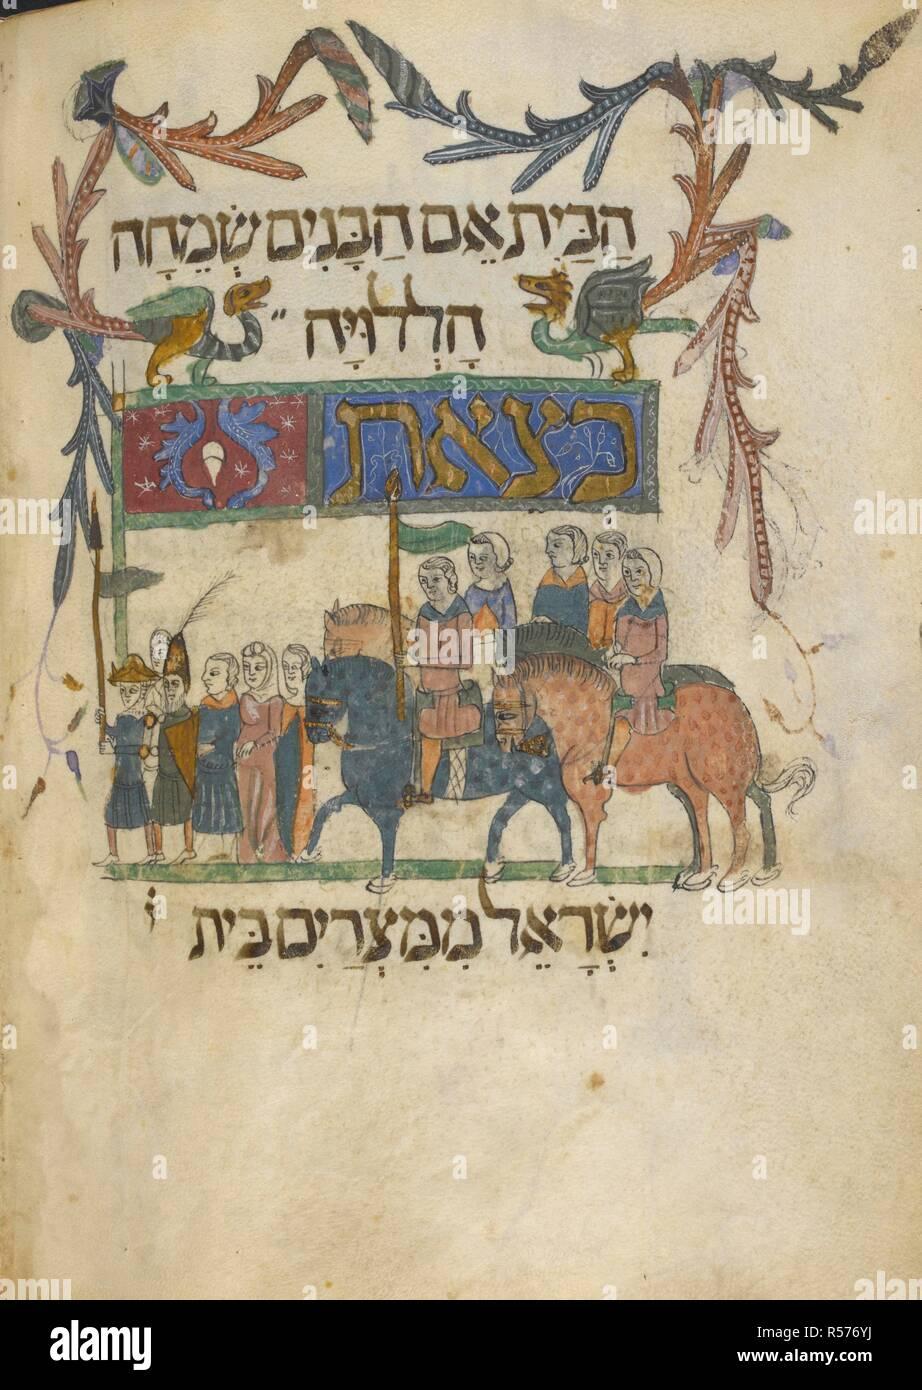 The Israelites leaving Egypt. Barcelona Haggadah. Catalonia, 14th century. Vellum manuscript.   . Source: Add. 14761, f.66v. Language: Hebrew. - Stock Image